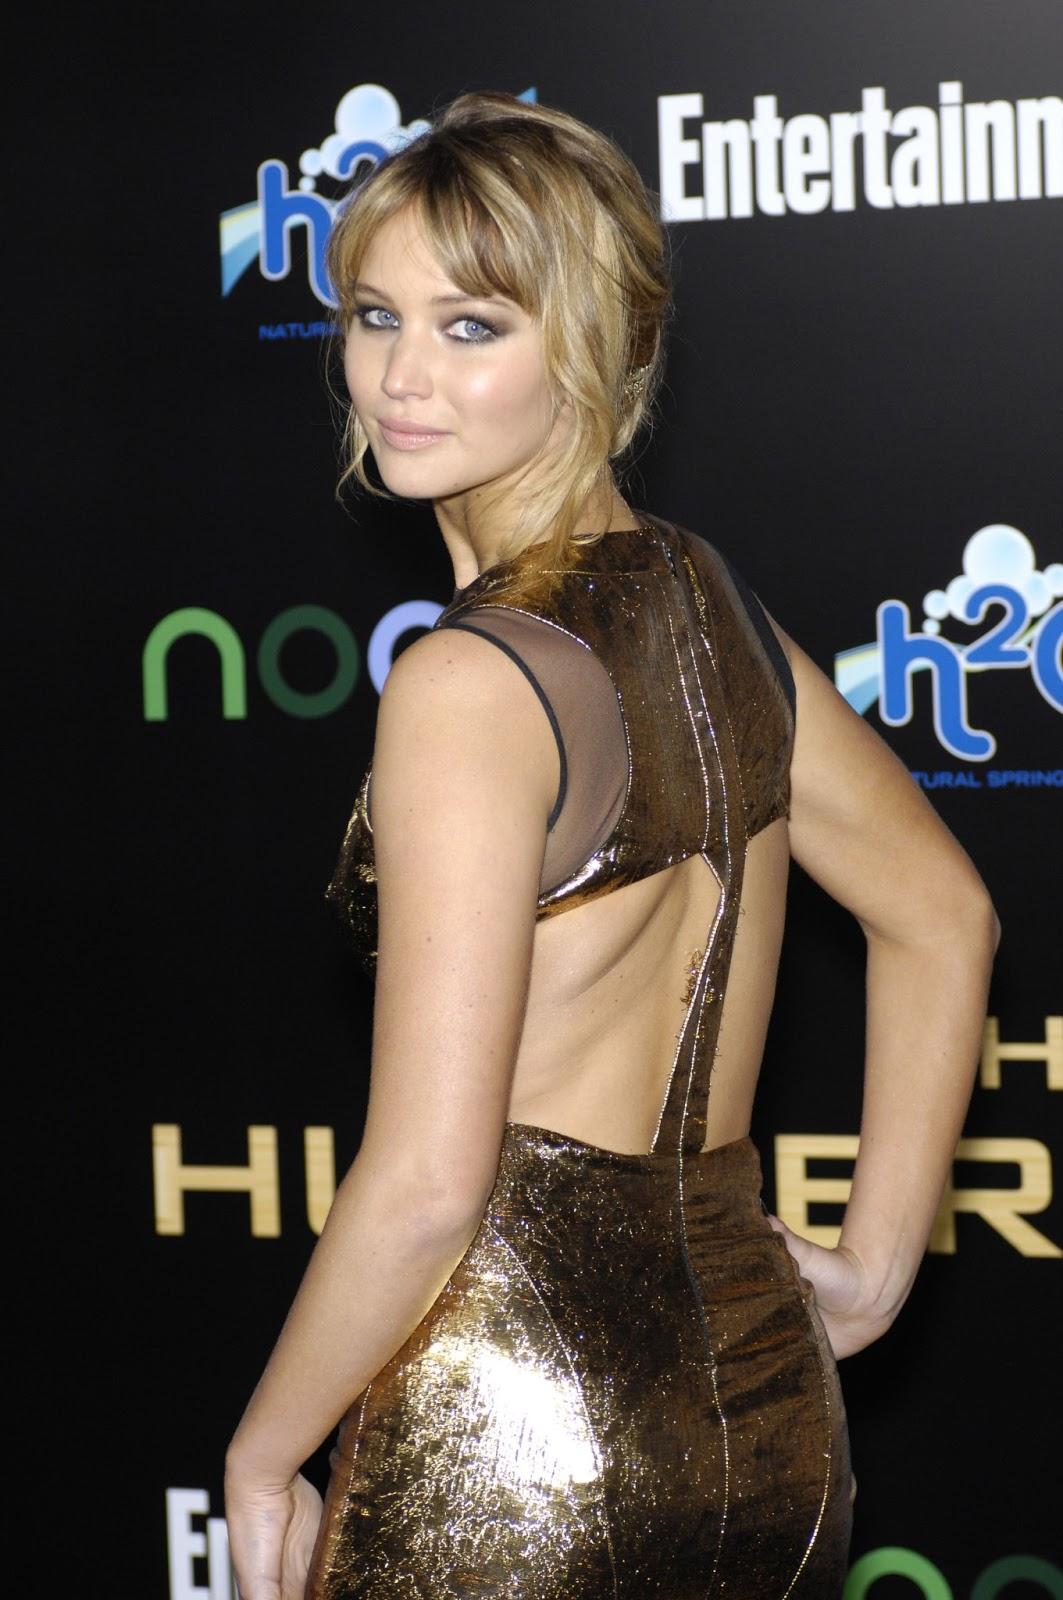 Celebrities Hot Booty Pics Hot Jennifer Lawrence Booty Pics-8696